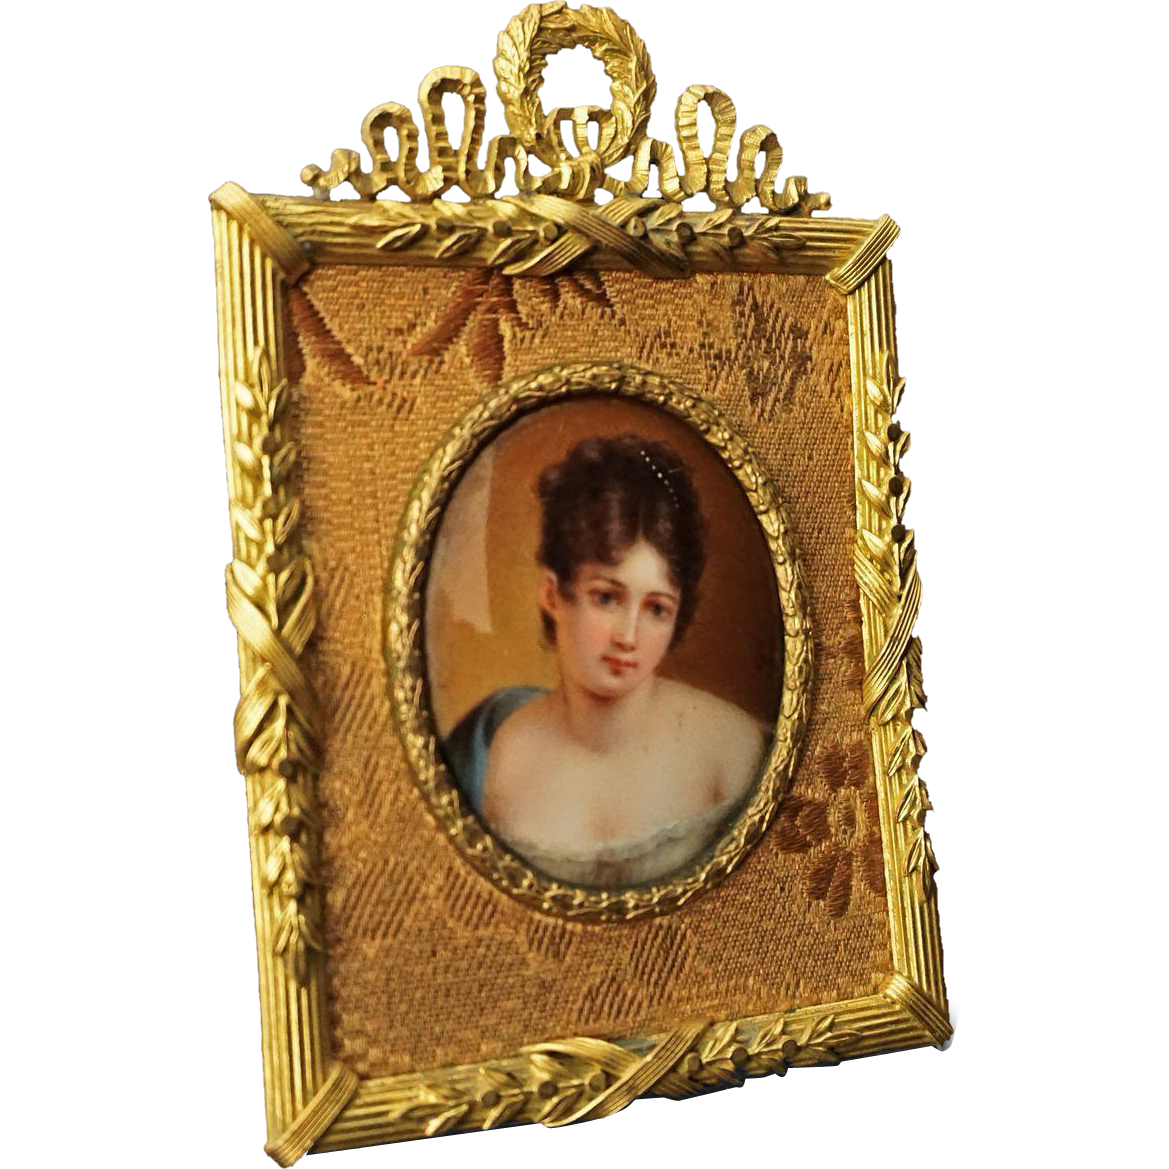 Miniature Portrait Painting on Porcelain of Madame Recamier after Francois Gerard